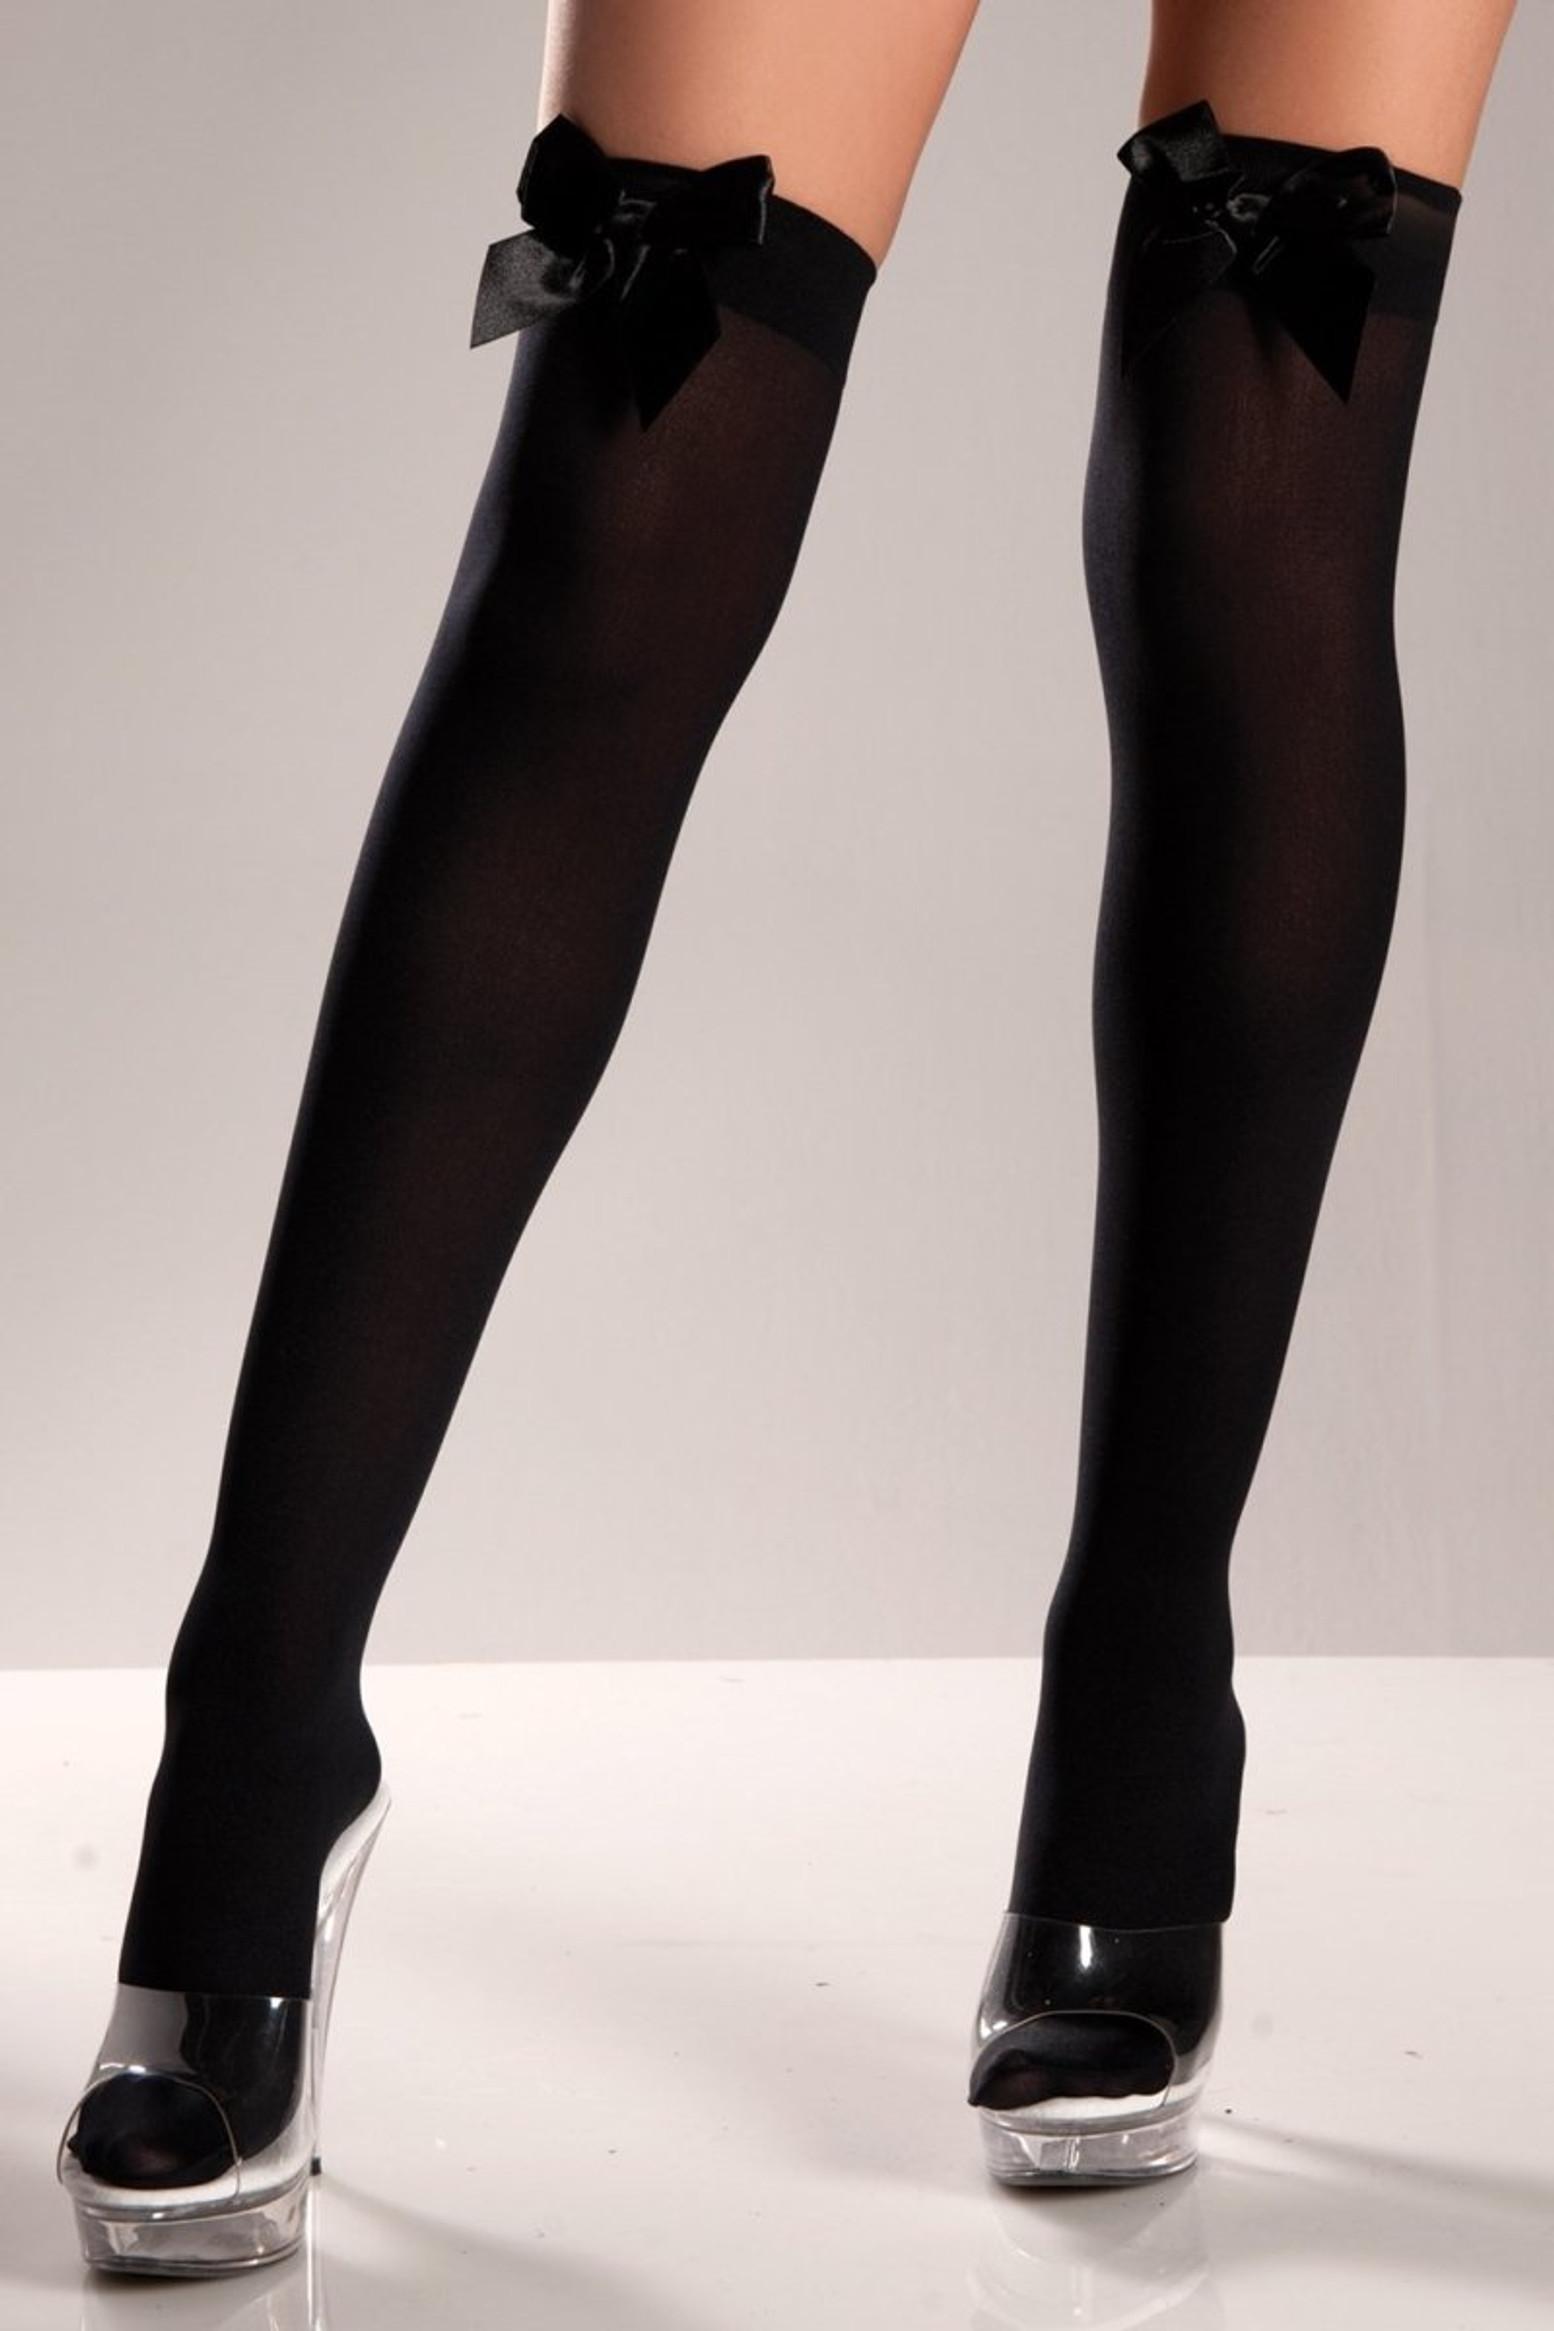 BW519B Black Opaque Thigh Highs